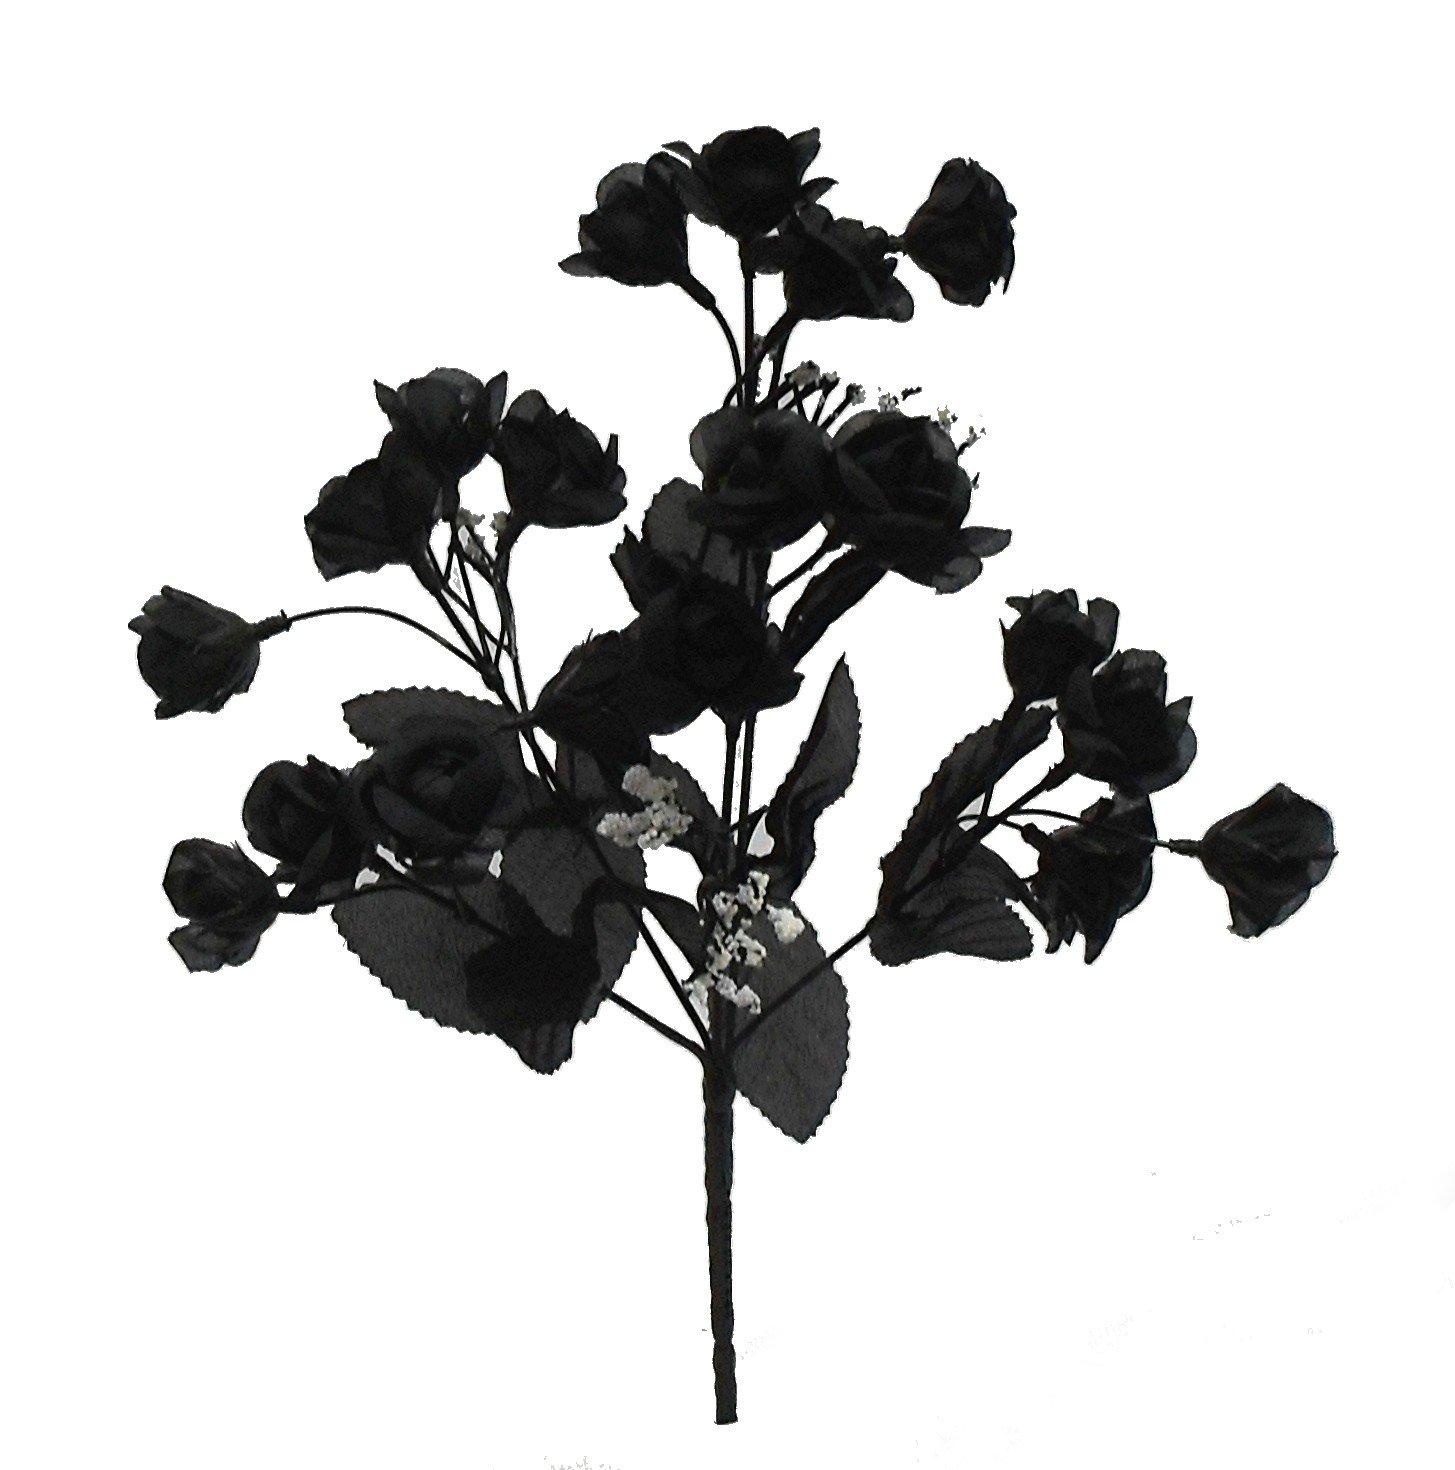 145-Mini-Open-Rose-Bush-Artificial-Silk-Wedding-Bridal-Craft-Bouquet-Flowers-5-Stems-20-Roses